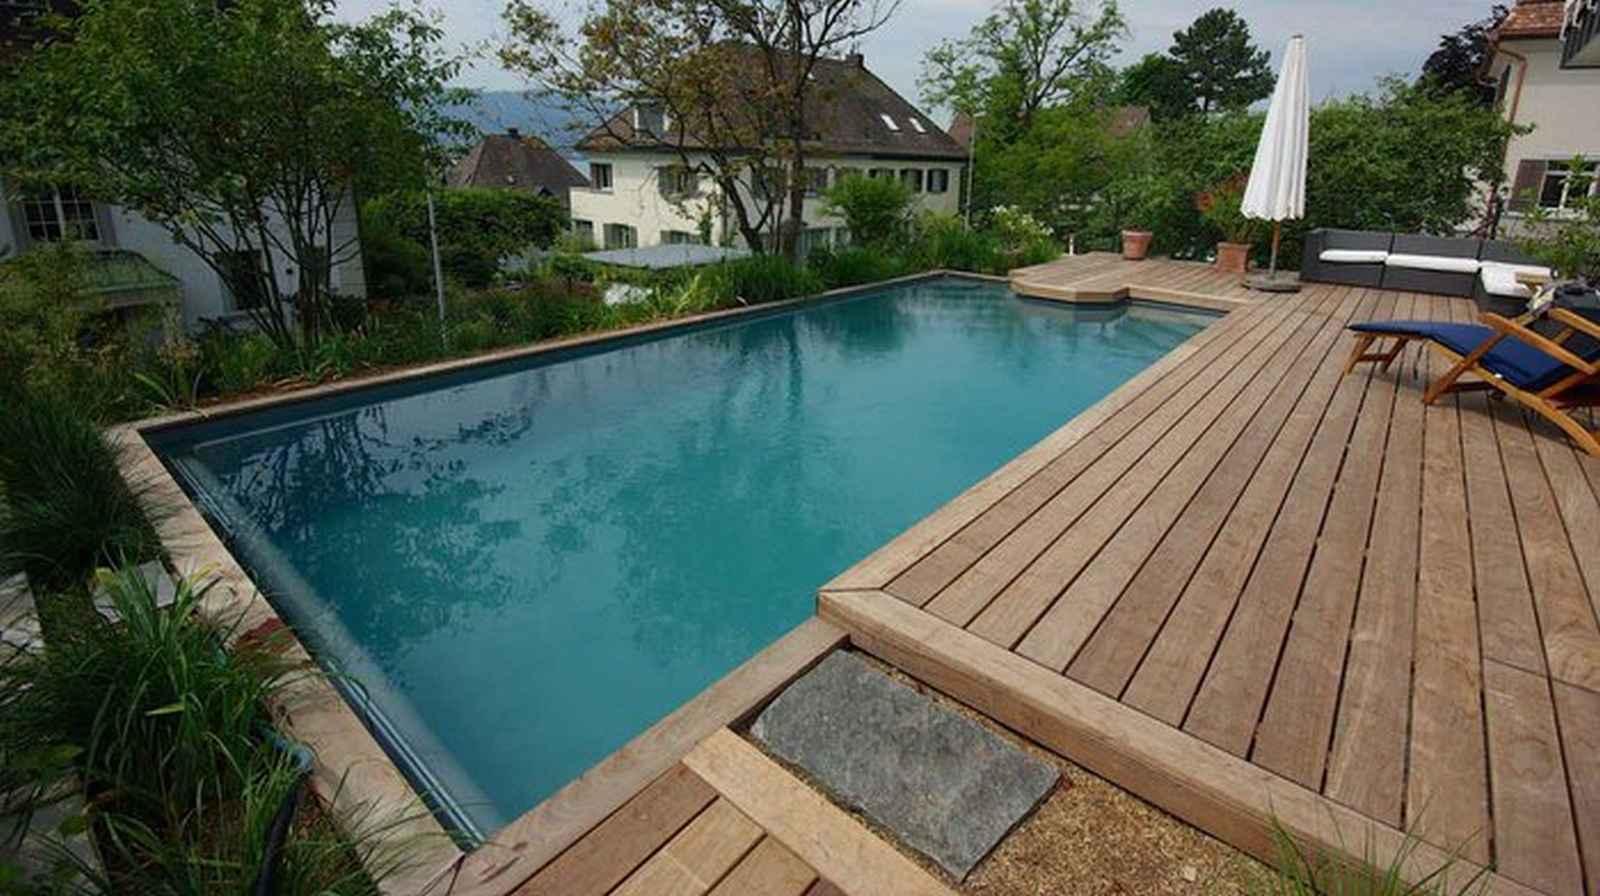 Pool mit stahlrahmen haus dekoration - Pool mit stahlrahmen ...